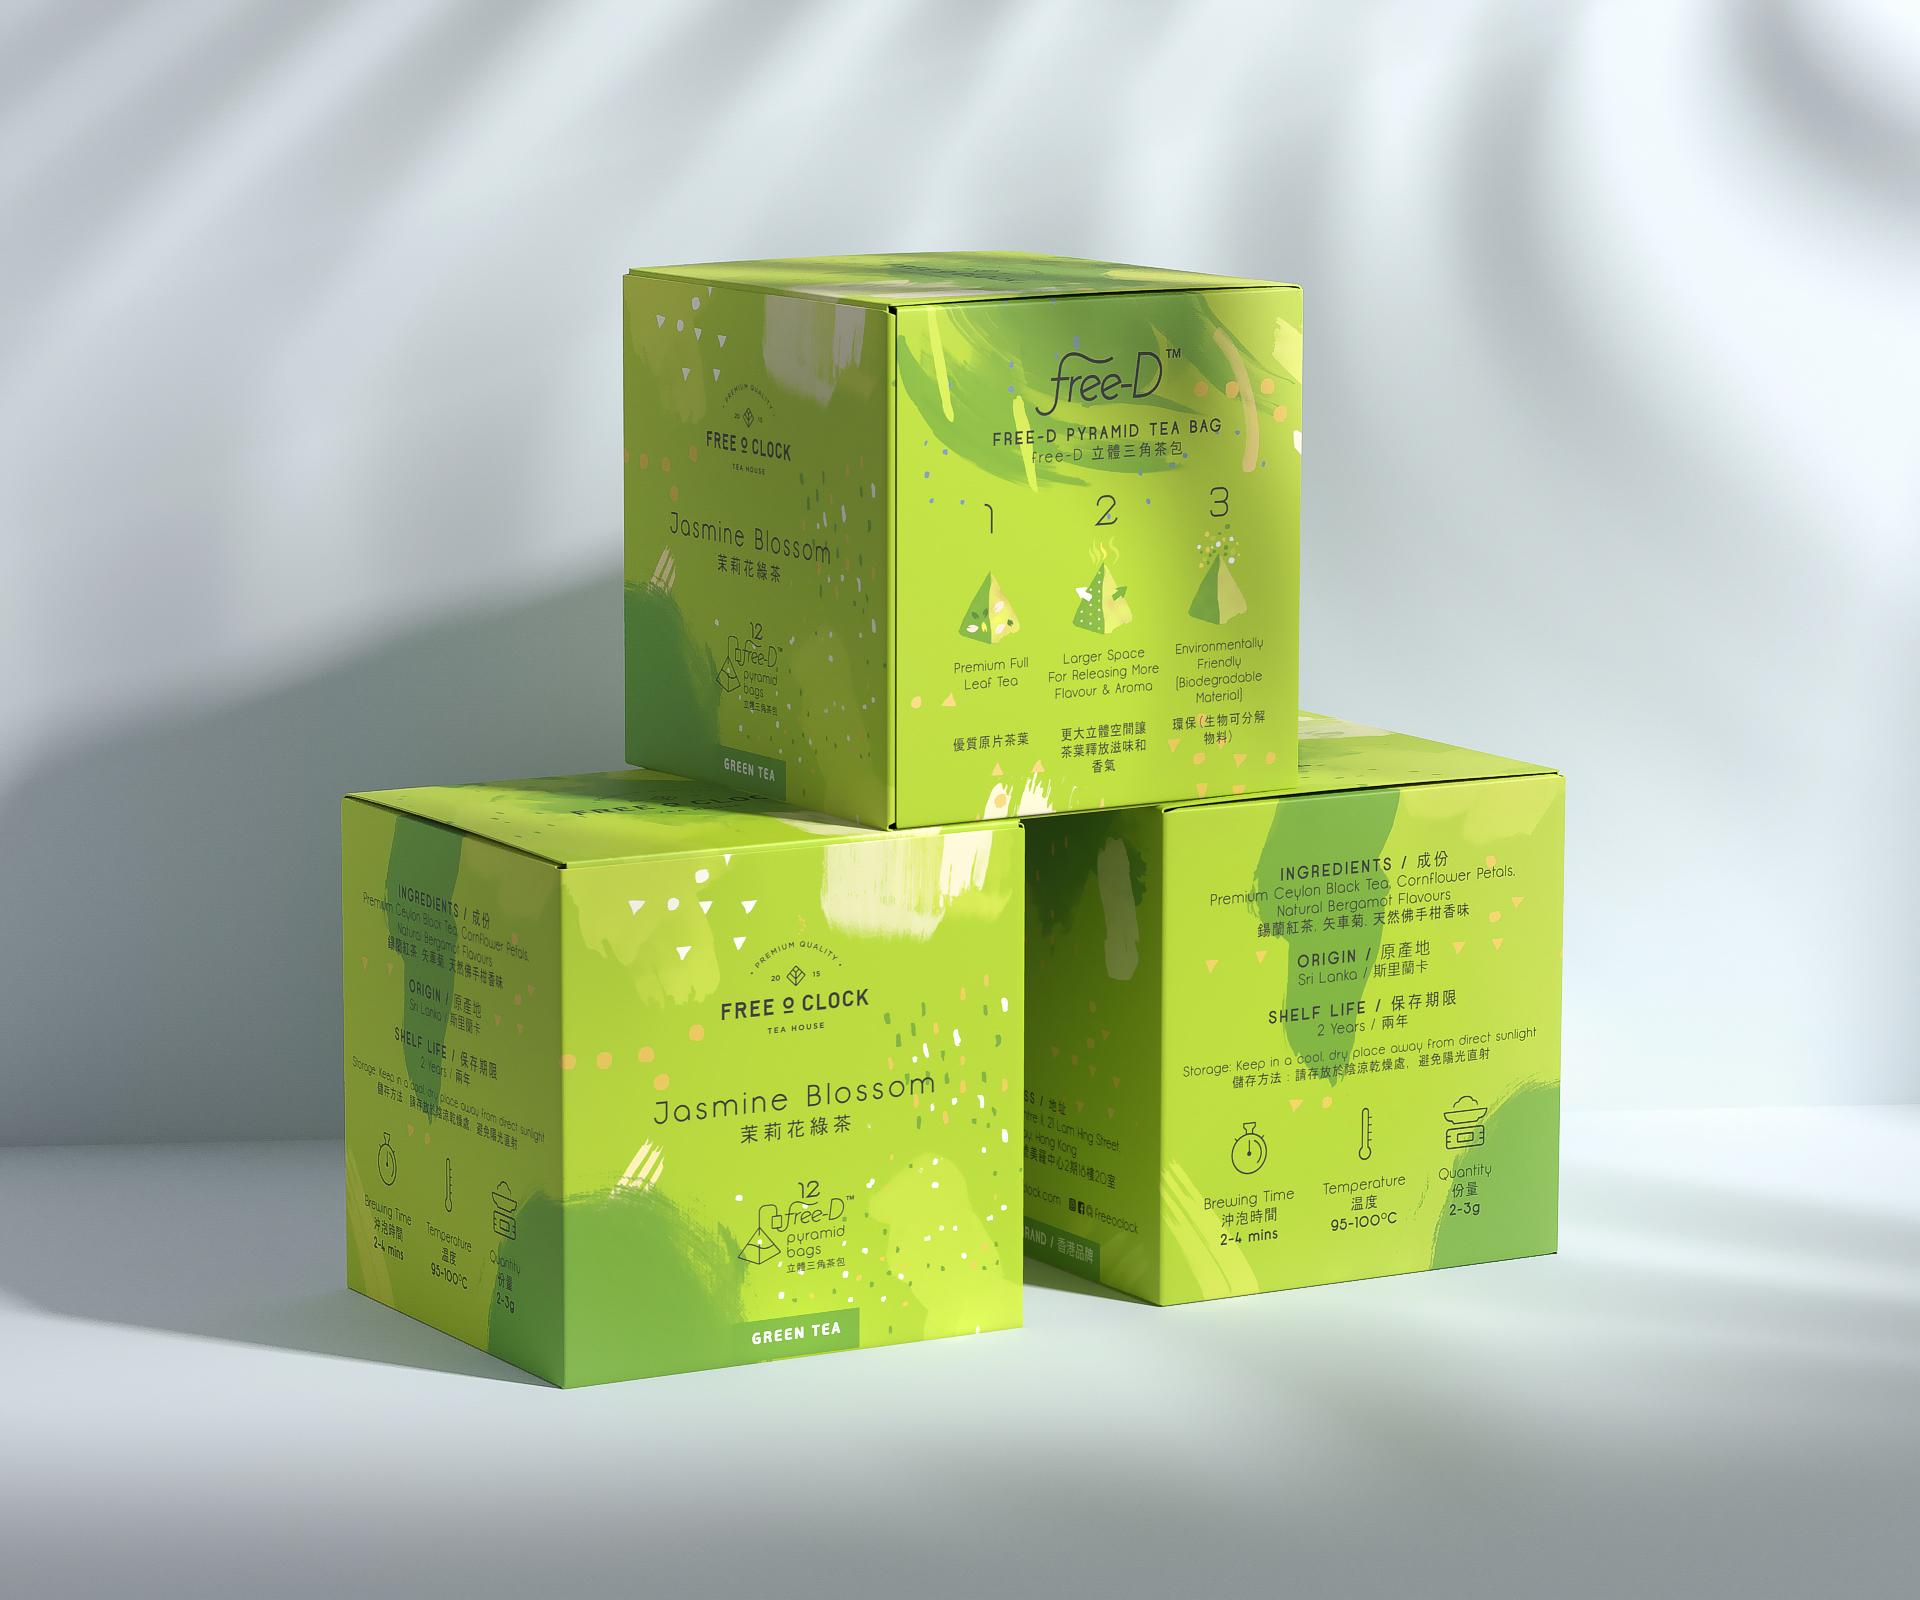 Freeoclock   3 pcs green tea